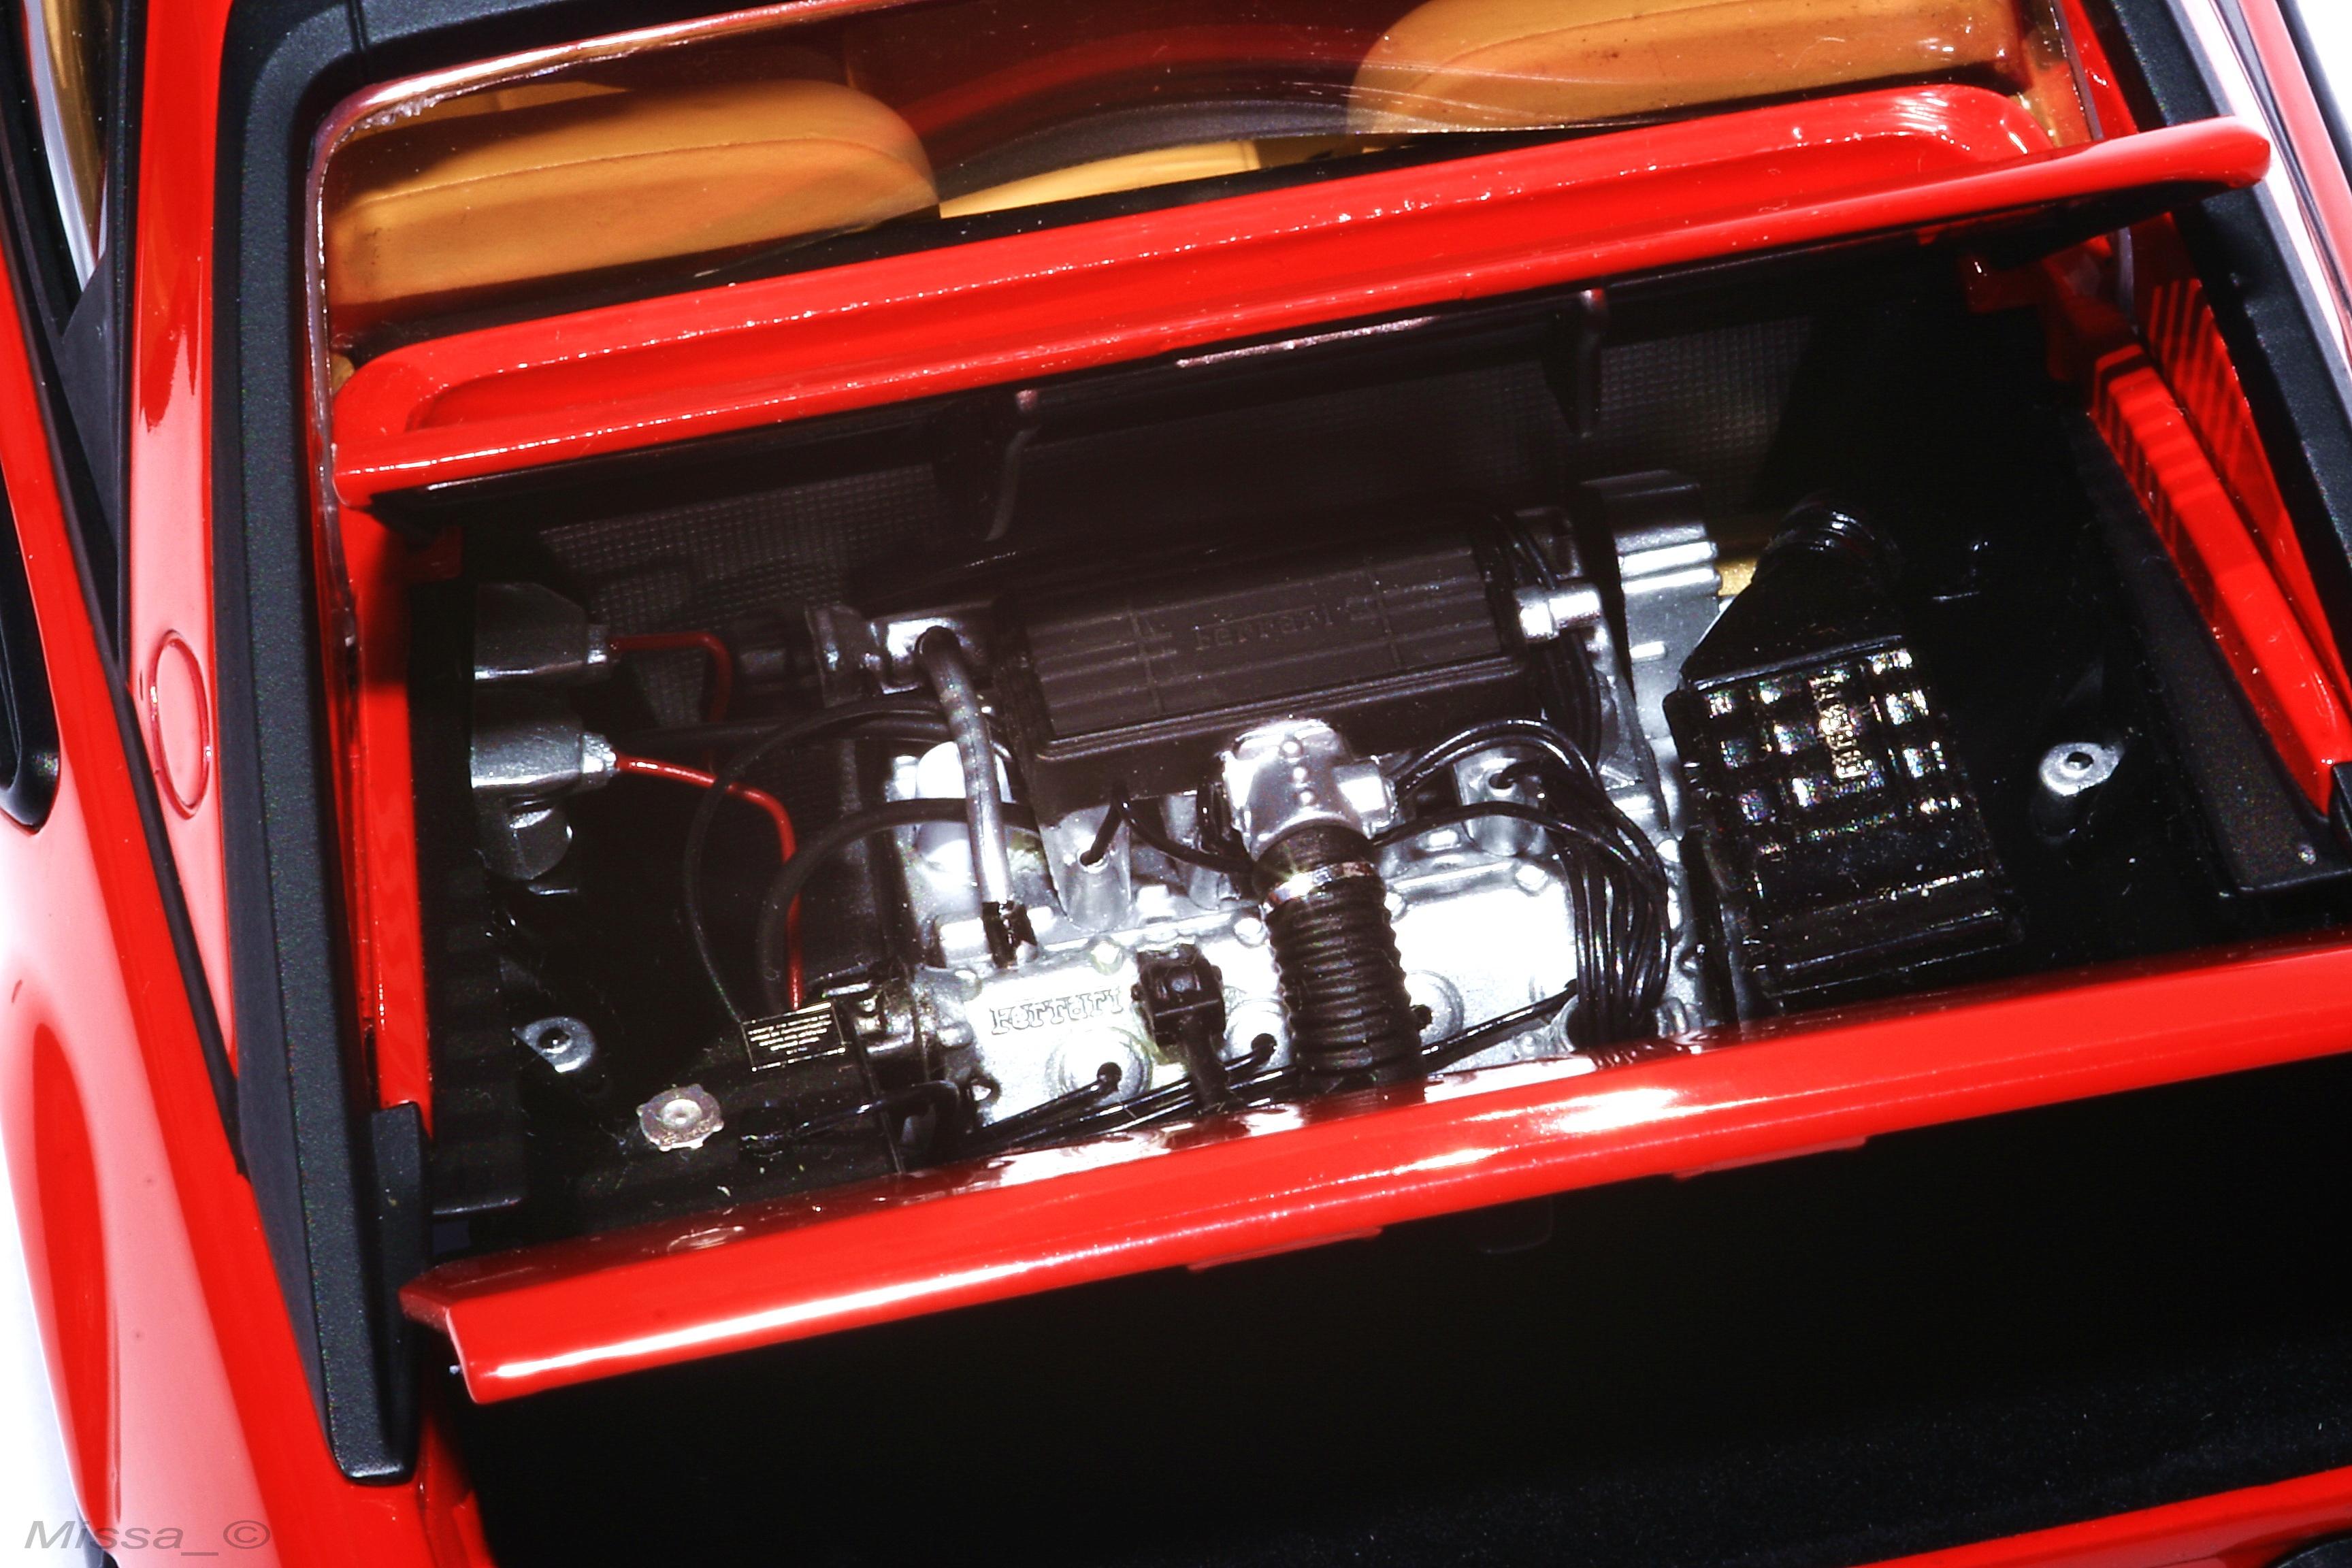 032_elite_ferrari_monq0xrb Fabulous Ferrari Mondial 8 Super Elite Cars Trend